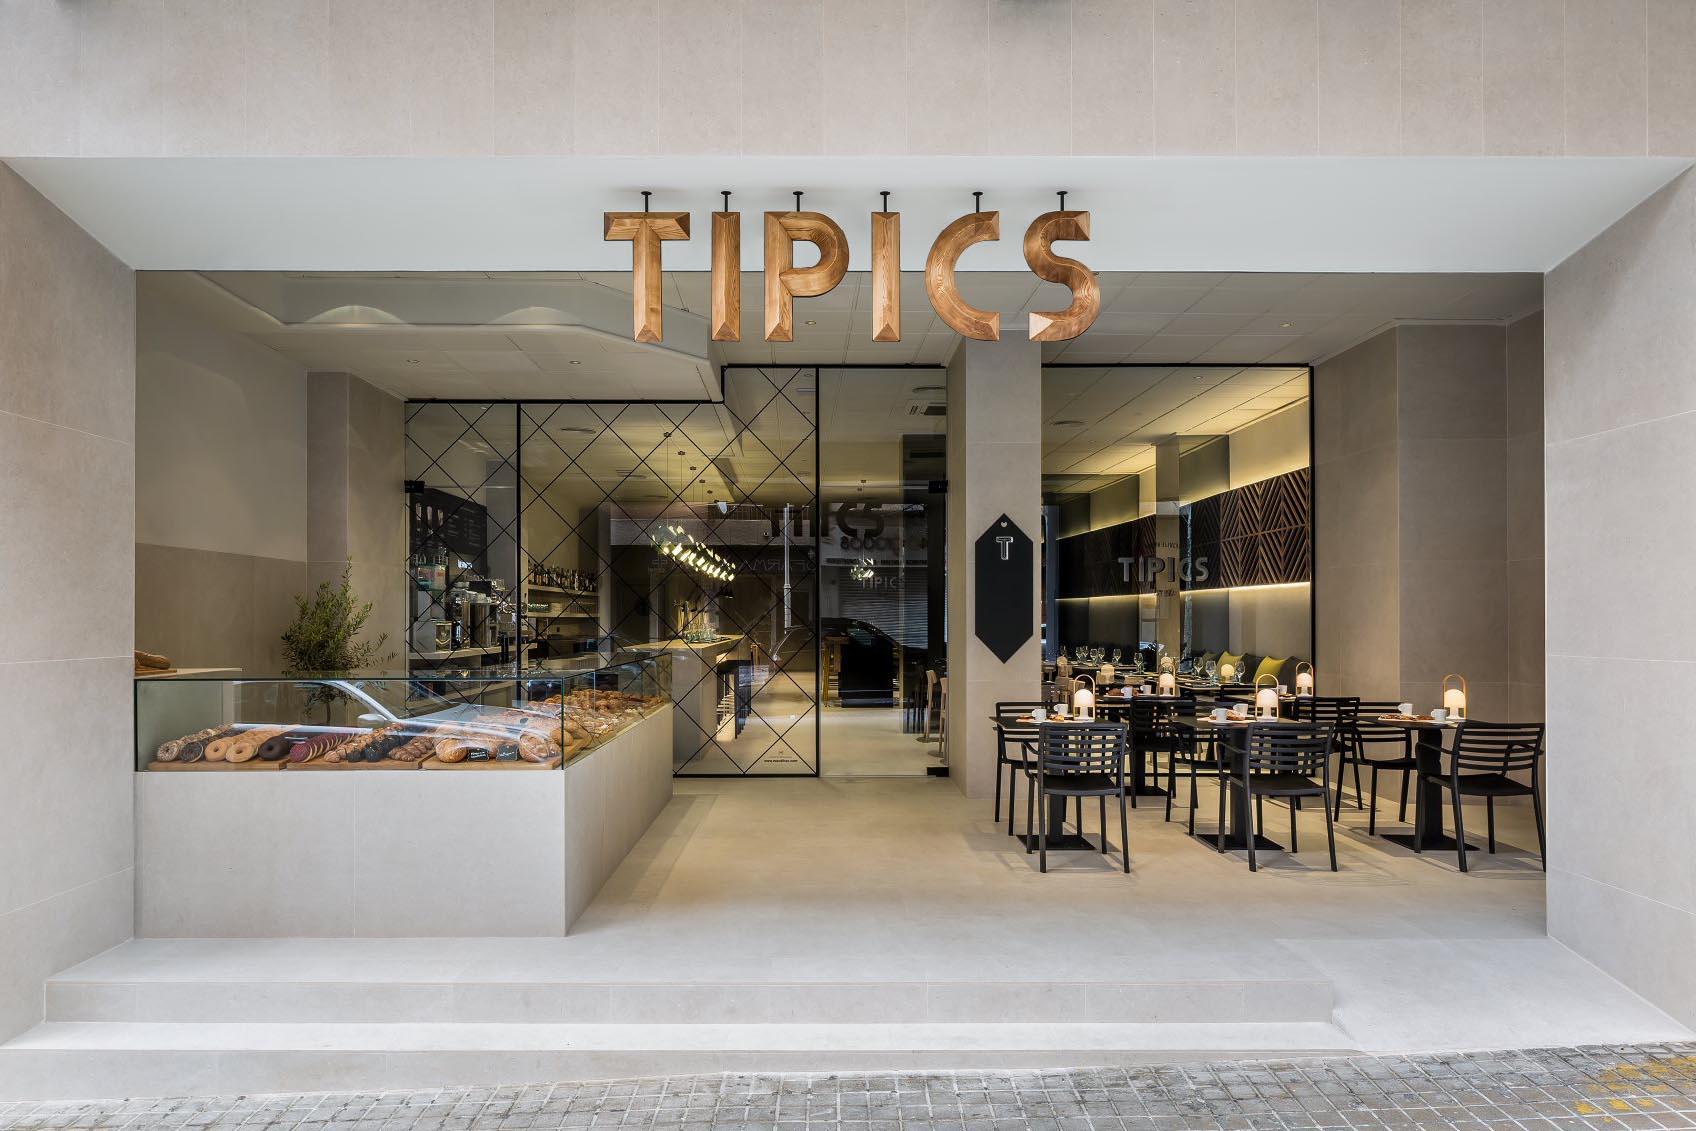 fotografia-arquitectura--interiorismo-valencia-german-cabo-estudihac-restaurante-tipics-xativa (x)_portada